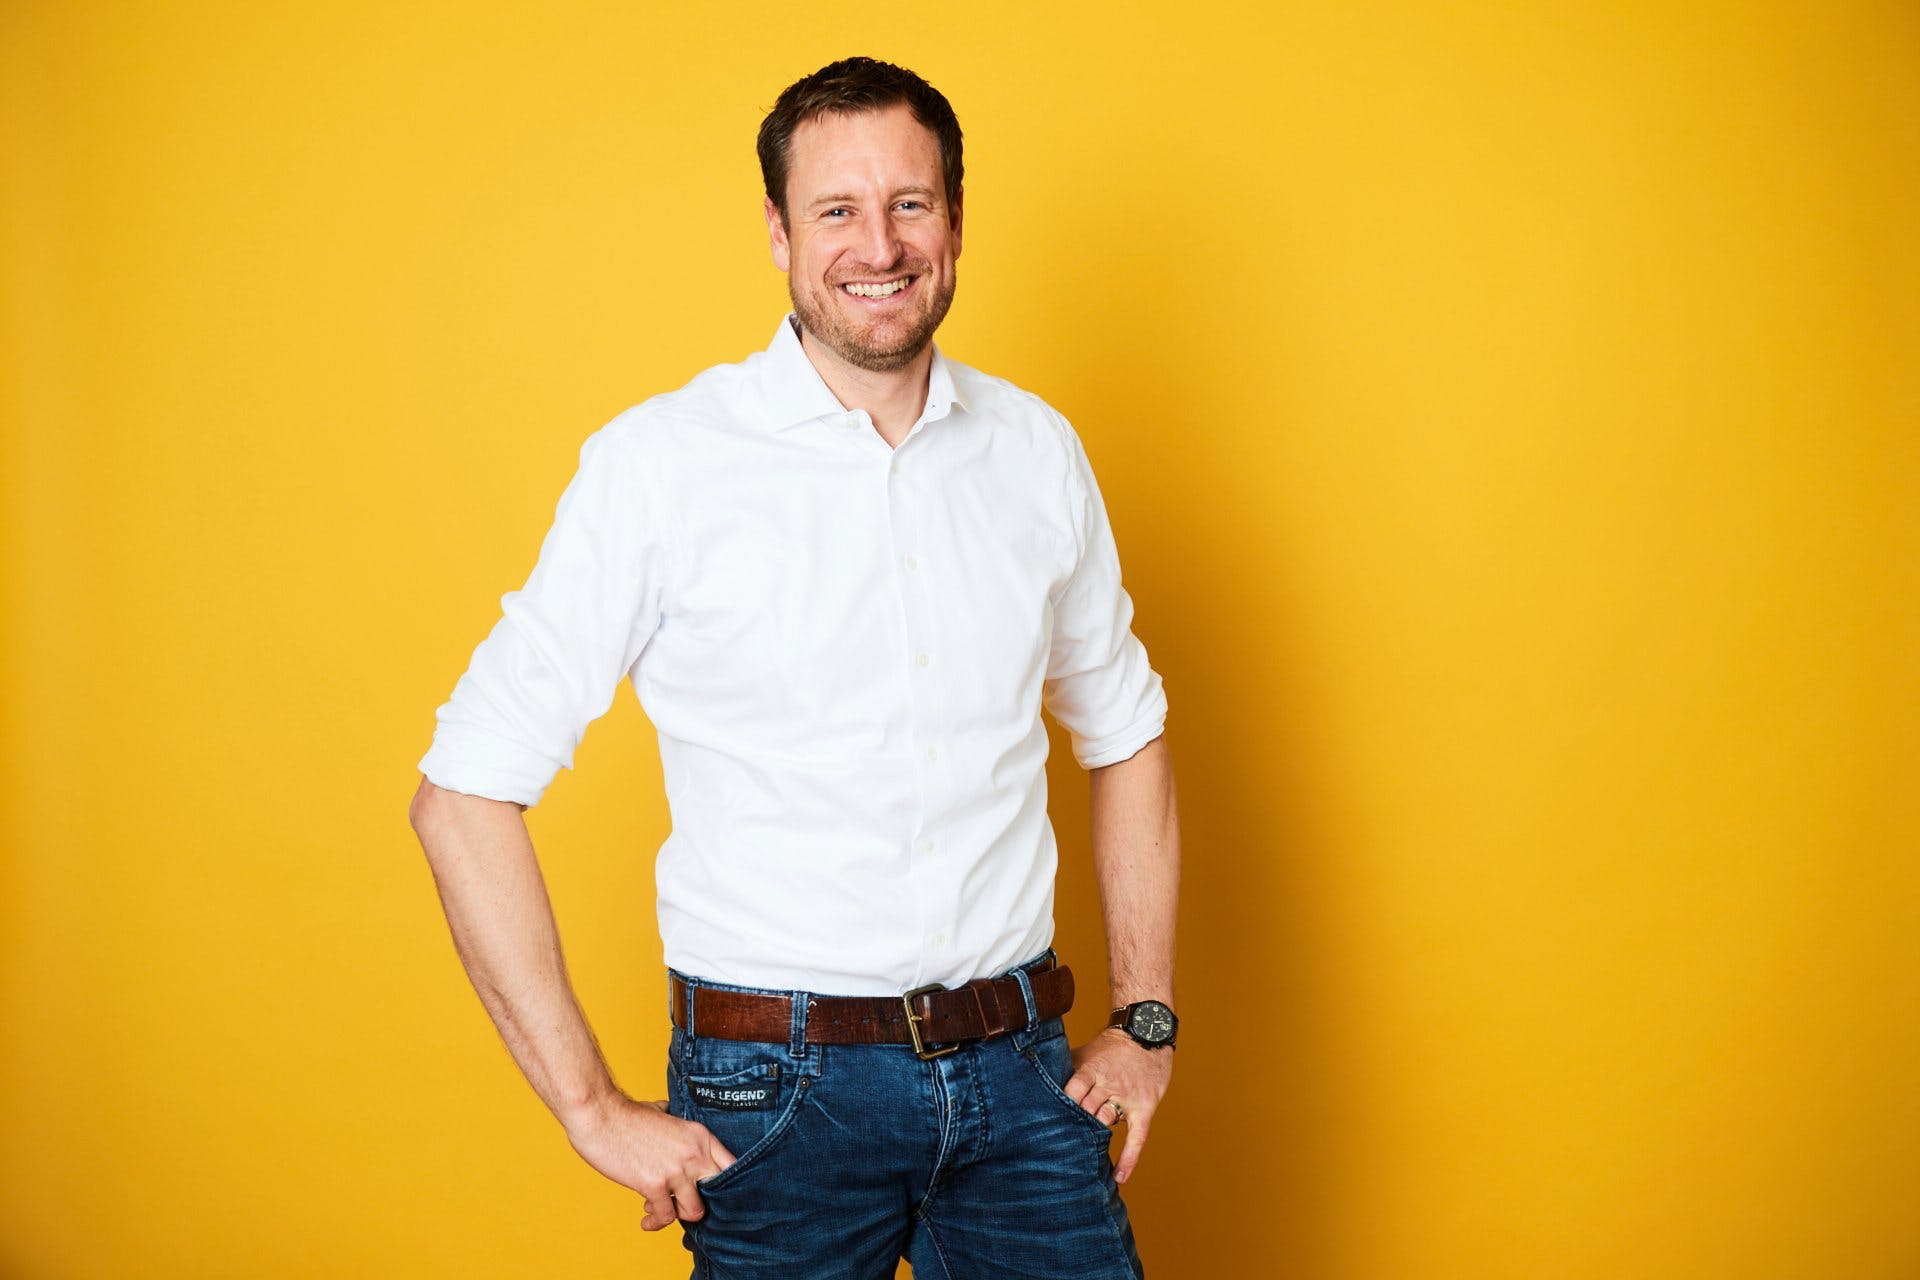 Philipp Dick, CEO und Mitgründer von Skribble (Quelle: Skribble)